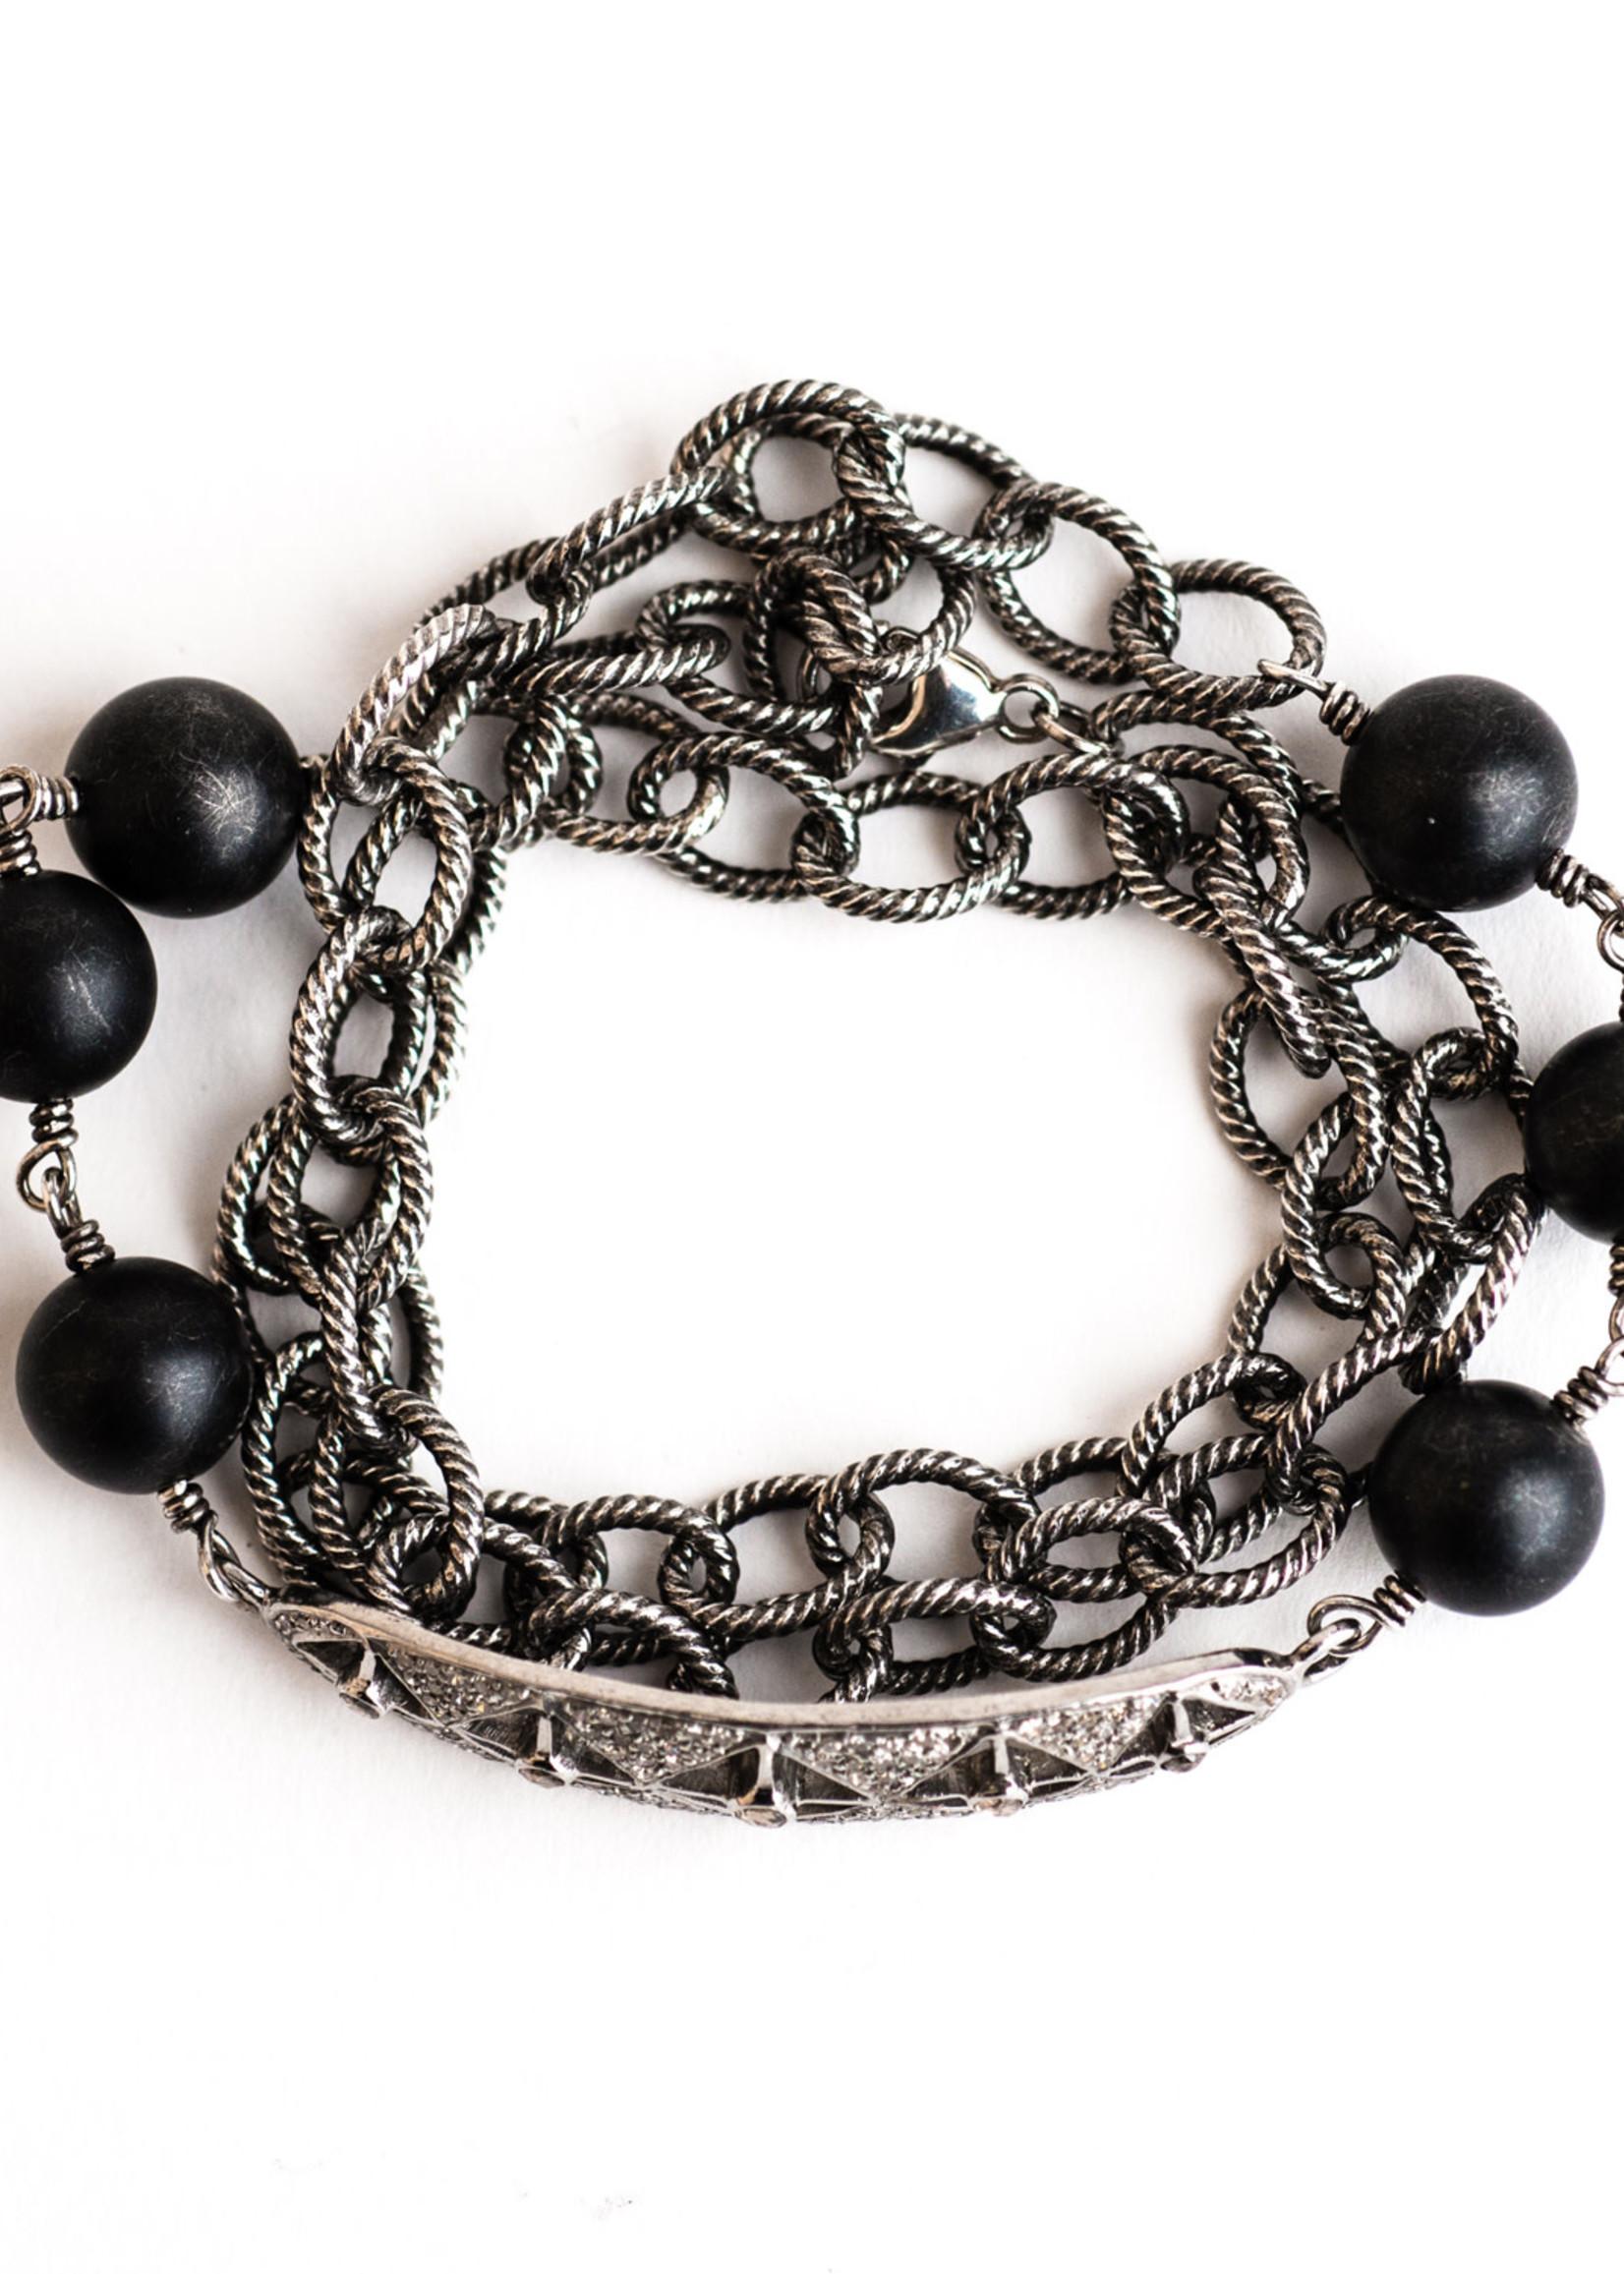 Mina Danielle Diamond Bar with Black Onyx and Oxidized Chain